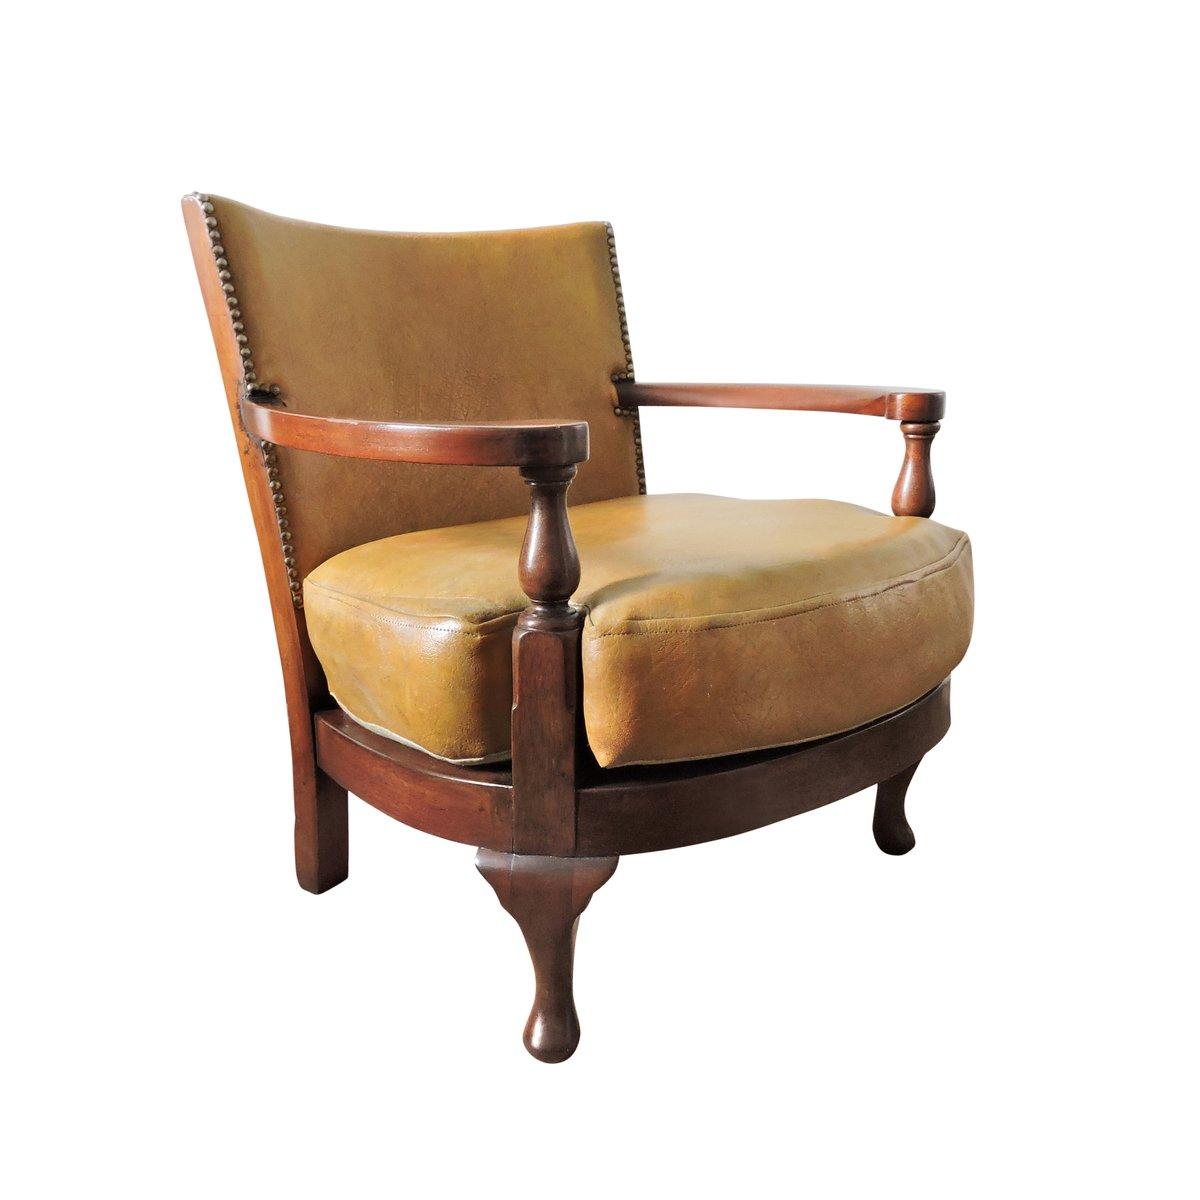 Vintage Sessel aus Senf gelbem Leder & Holz bei Pamono kaufen